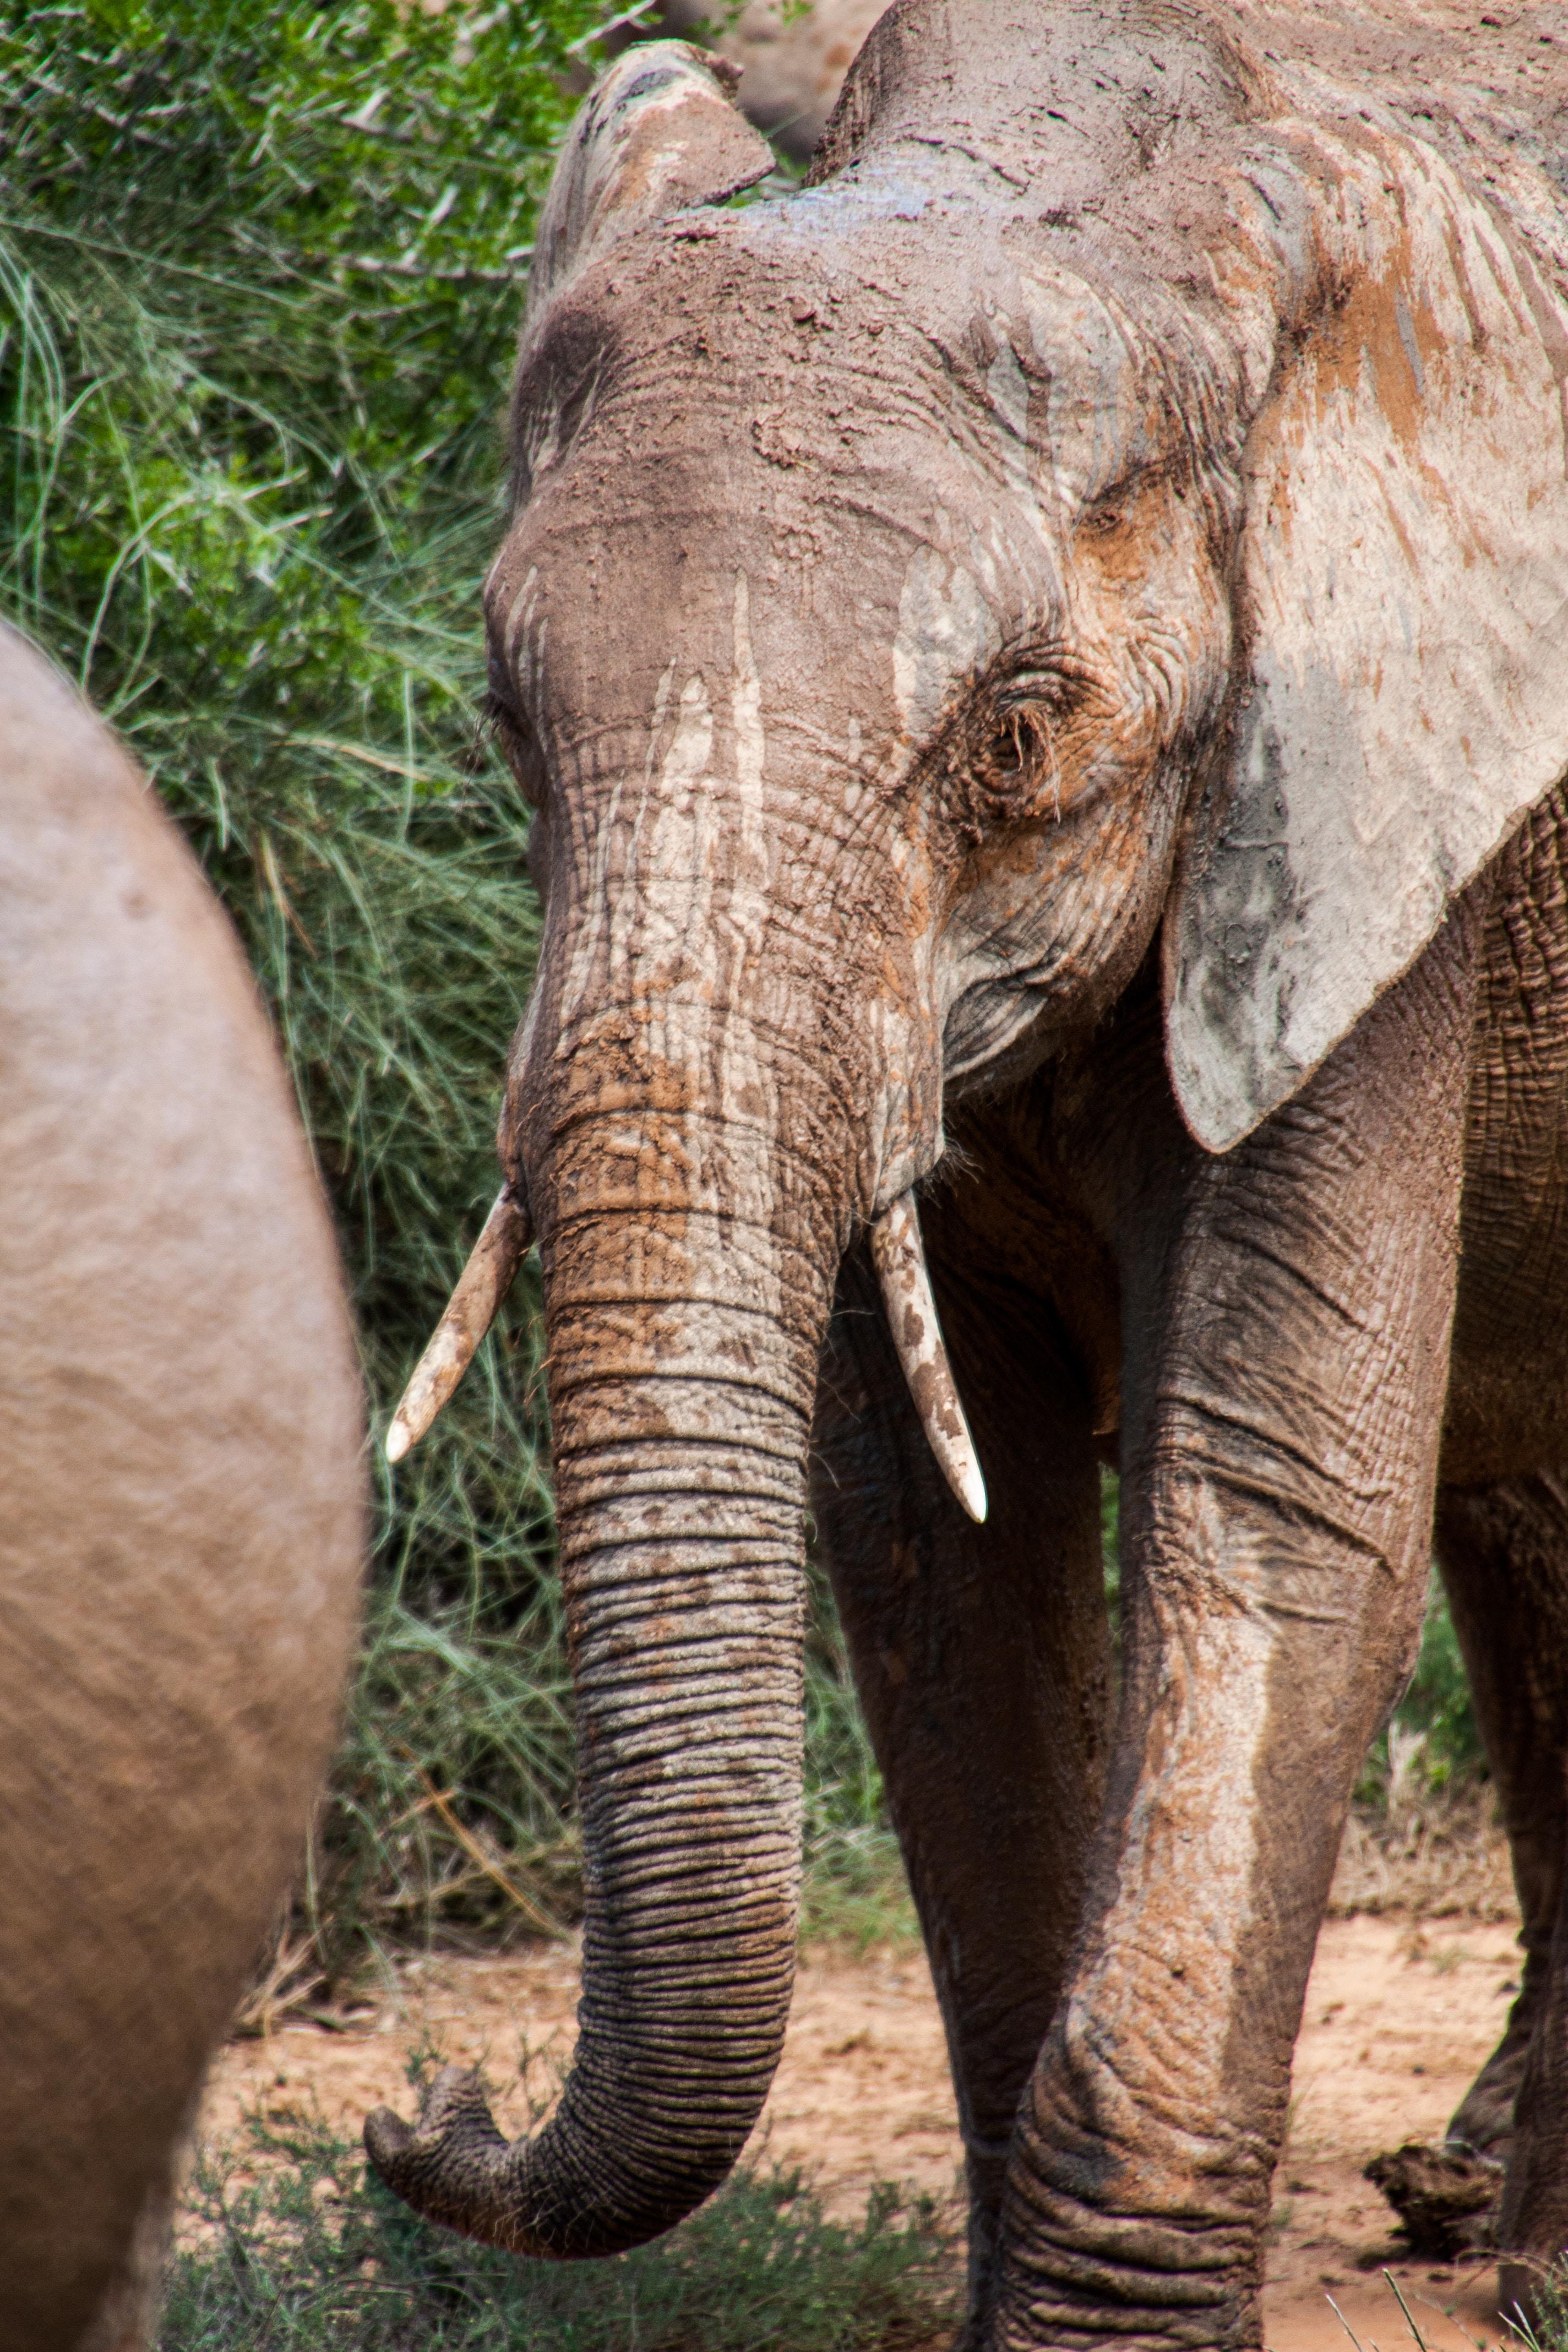 elephant near grass